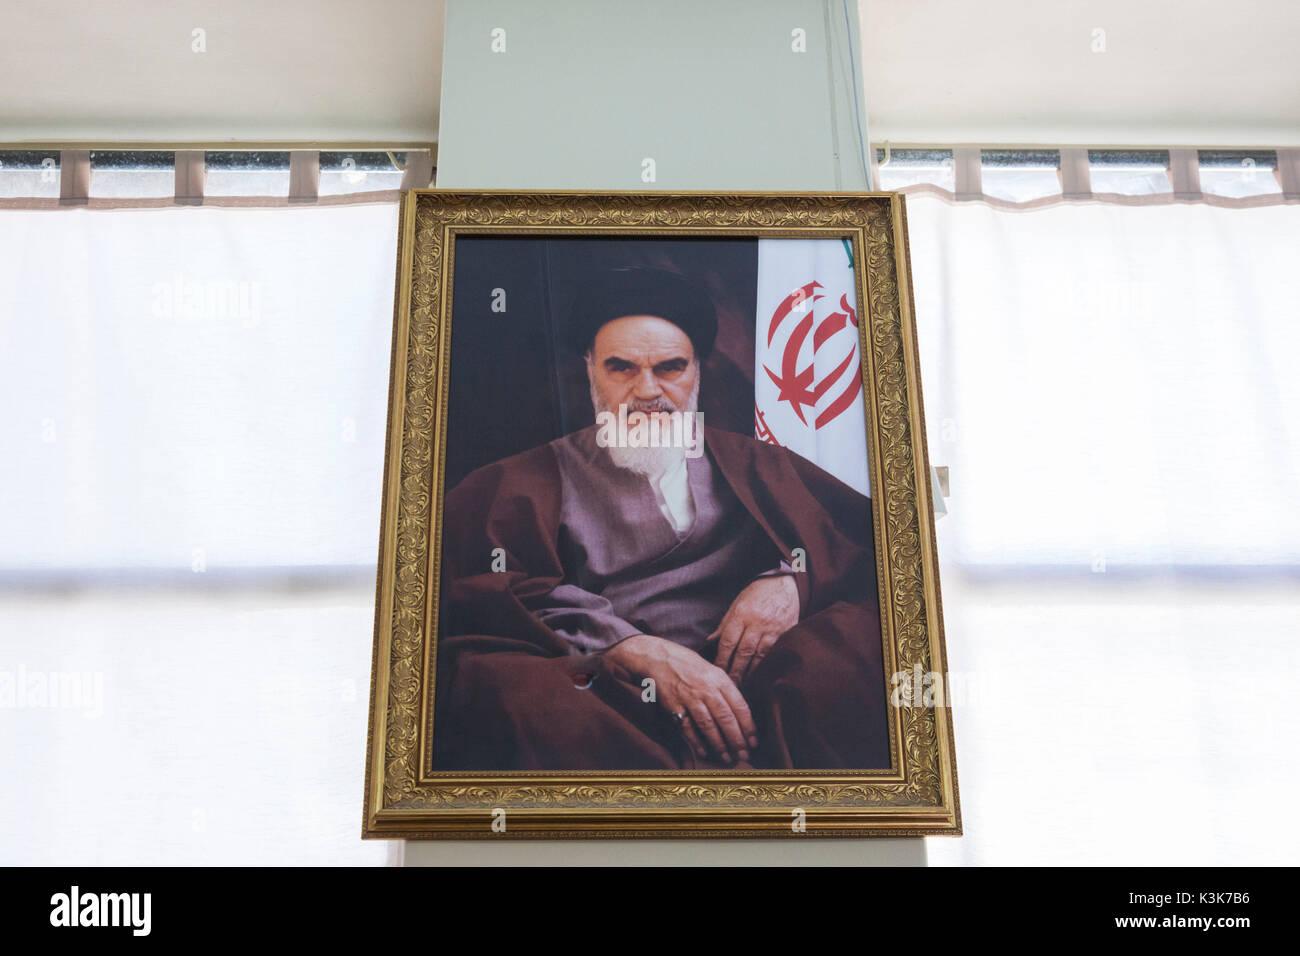 Iran, Tehran, portrait of fomer religious leader, Ayatollah Khomeini Stock Photo